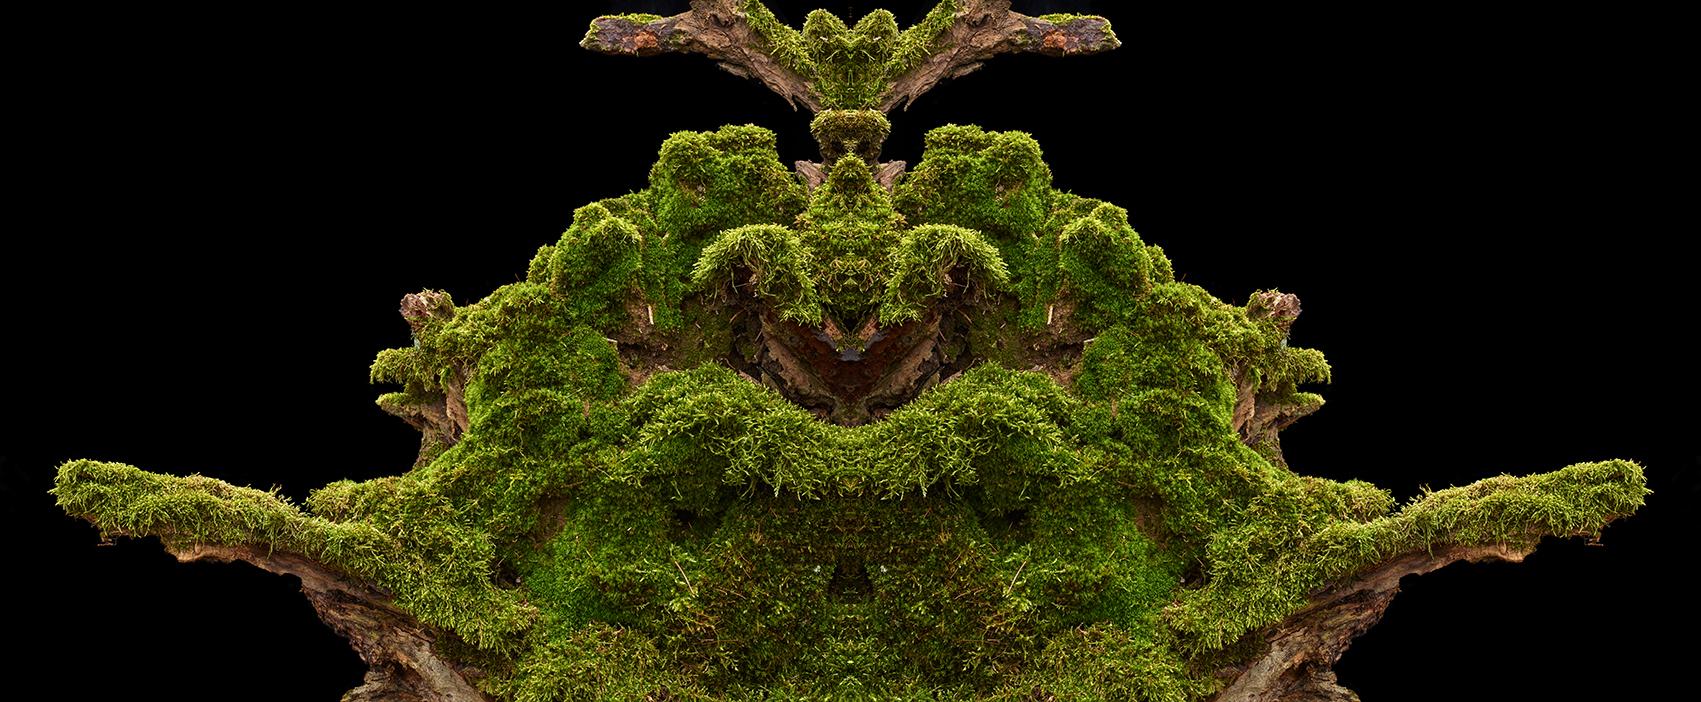 Wald-20